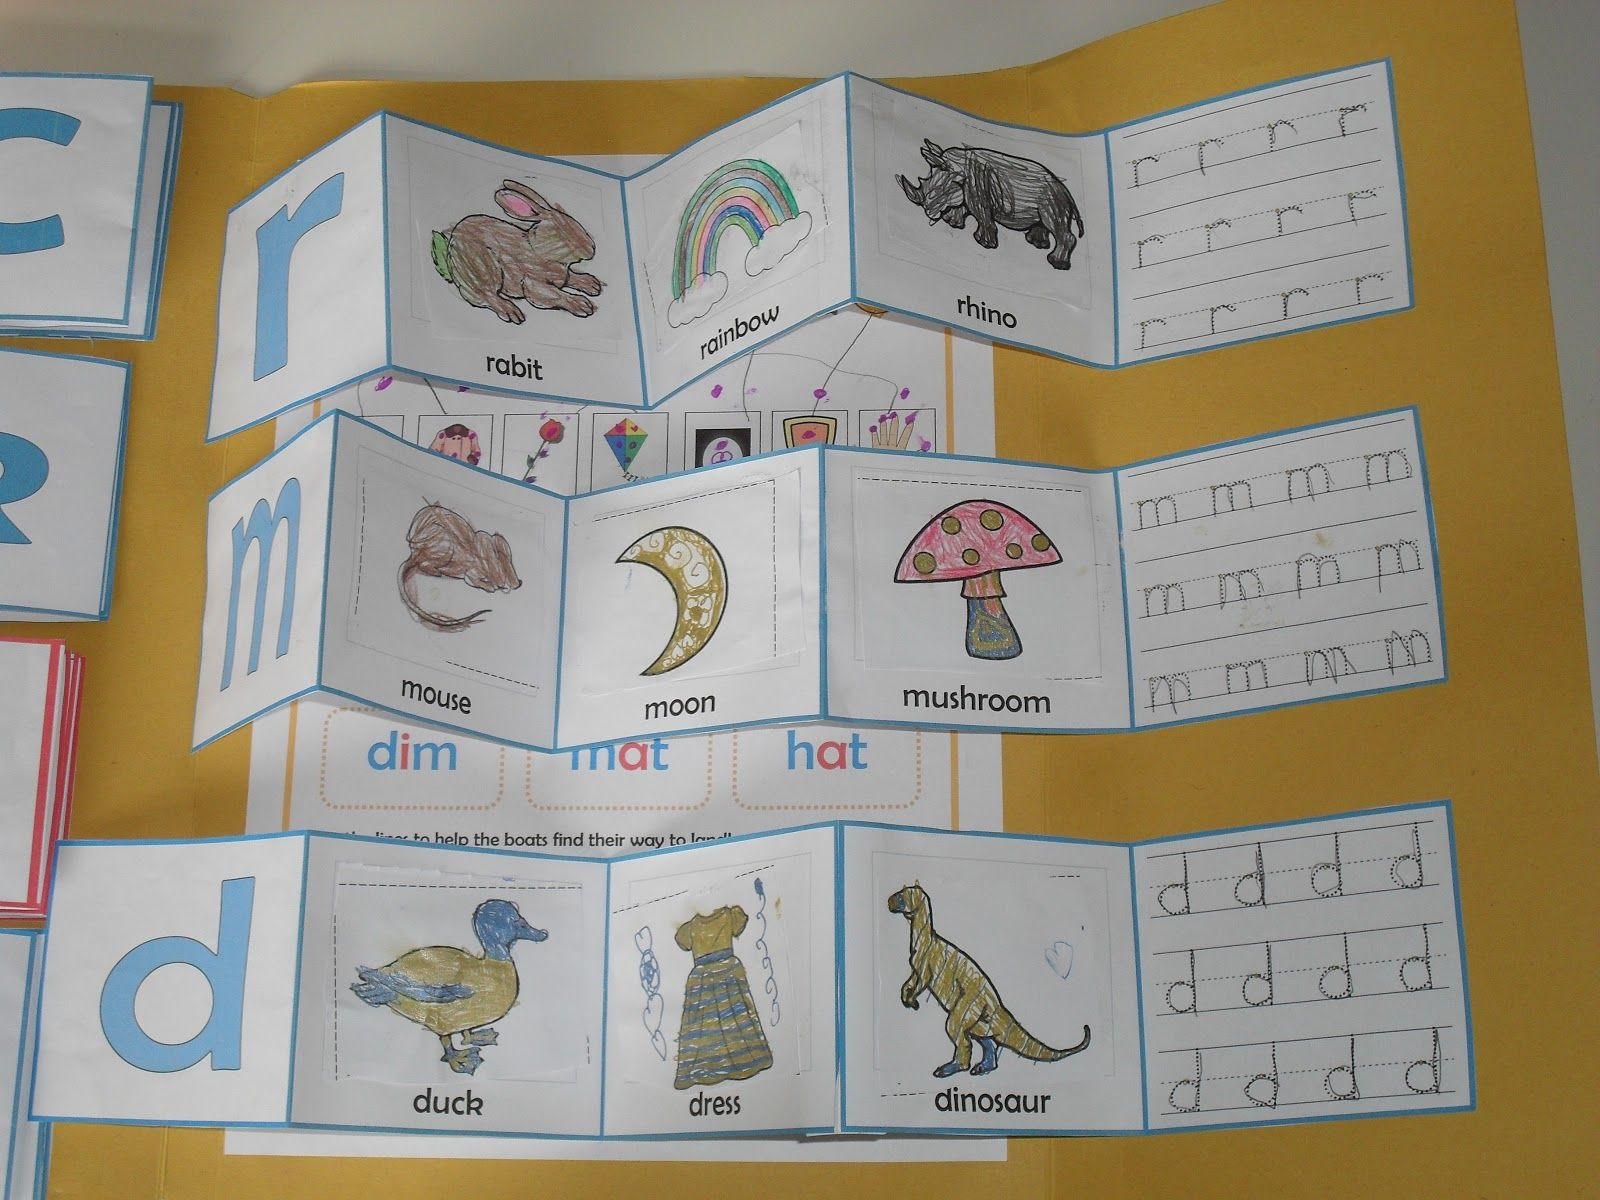 worksheet Montessori Printable Worksheets jolly phonics worksheets printables google search search